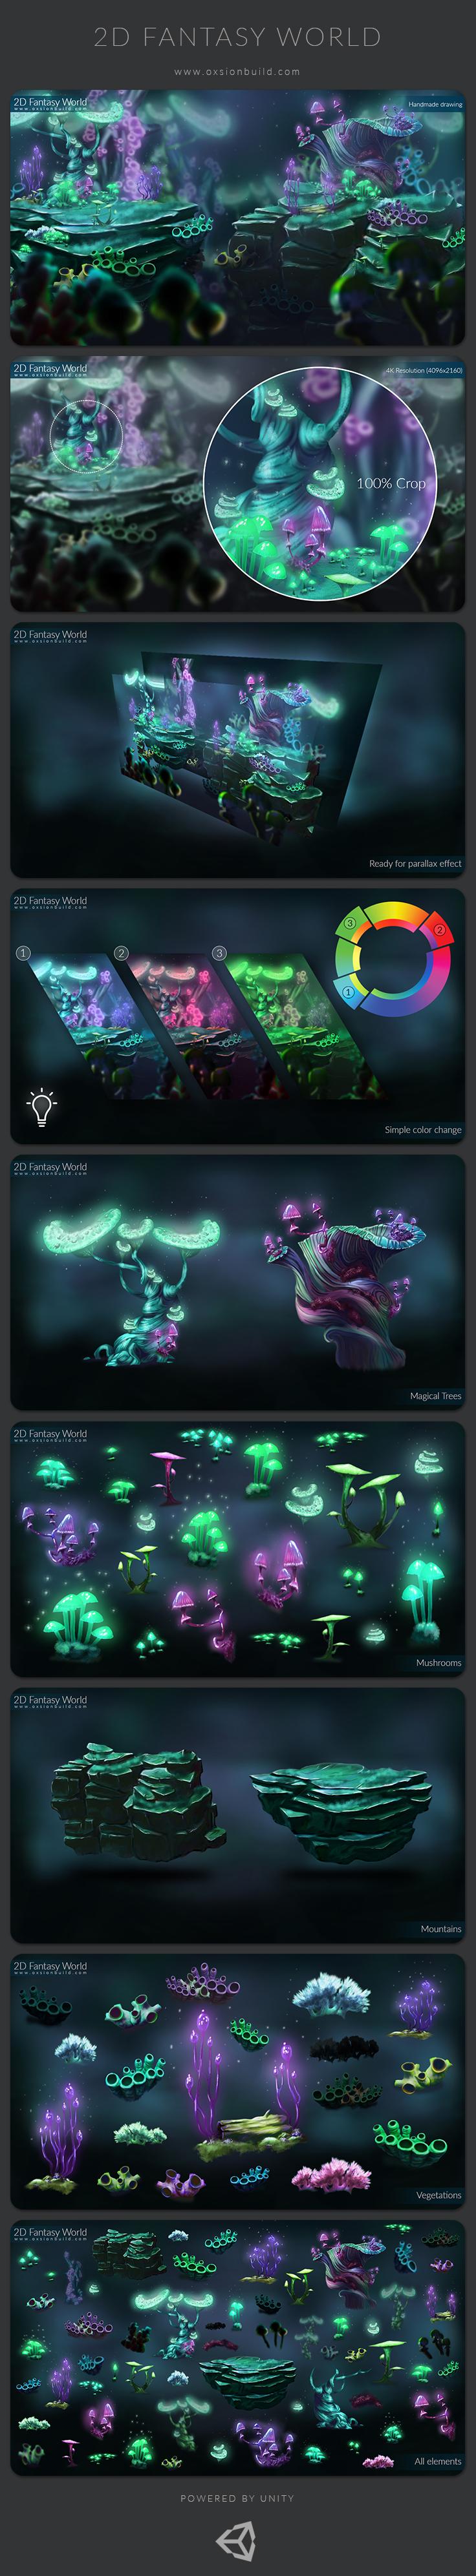 2D Fantasy World Ori platformer fantastic environment fairy Magical Painted handmade Drawing